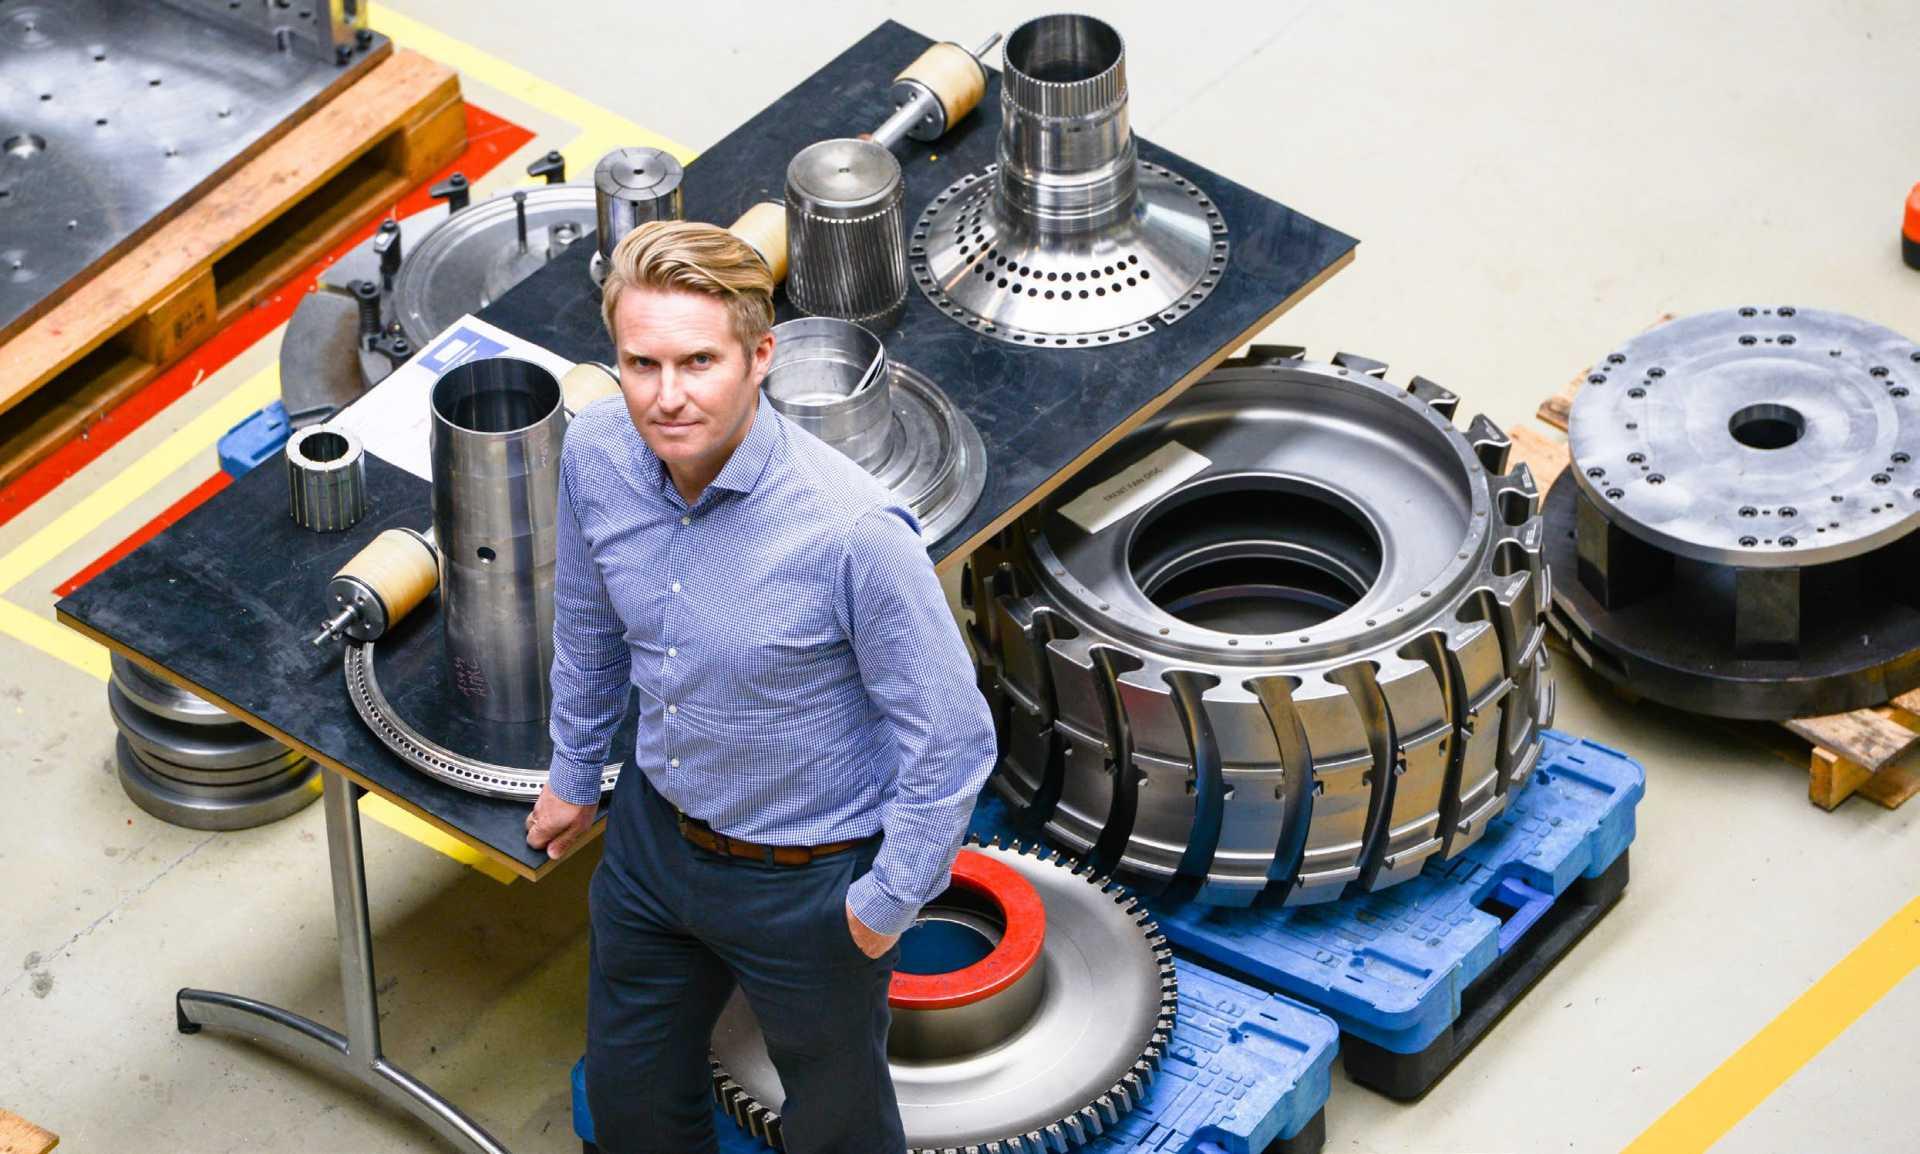 HVMC - Professor Sam Turner, CTO of the High Value Manufacturing Catapult - image courtesy of Ed Shaw/Sandvik Coromant, Metalworking World.